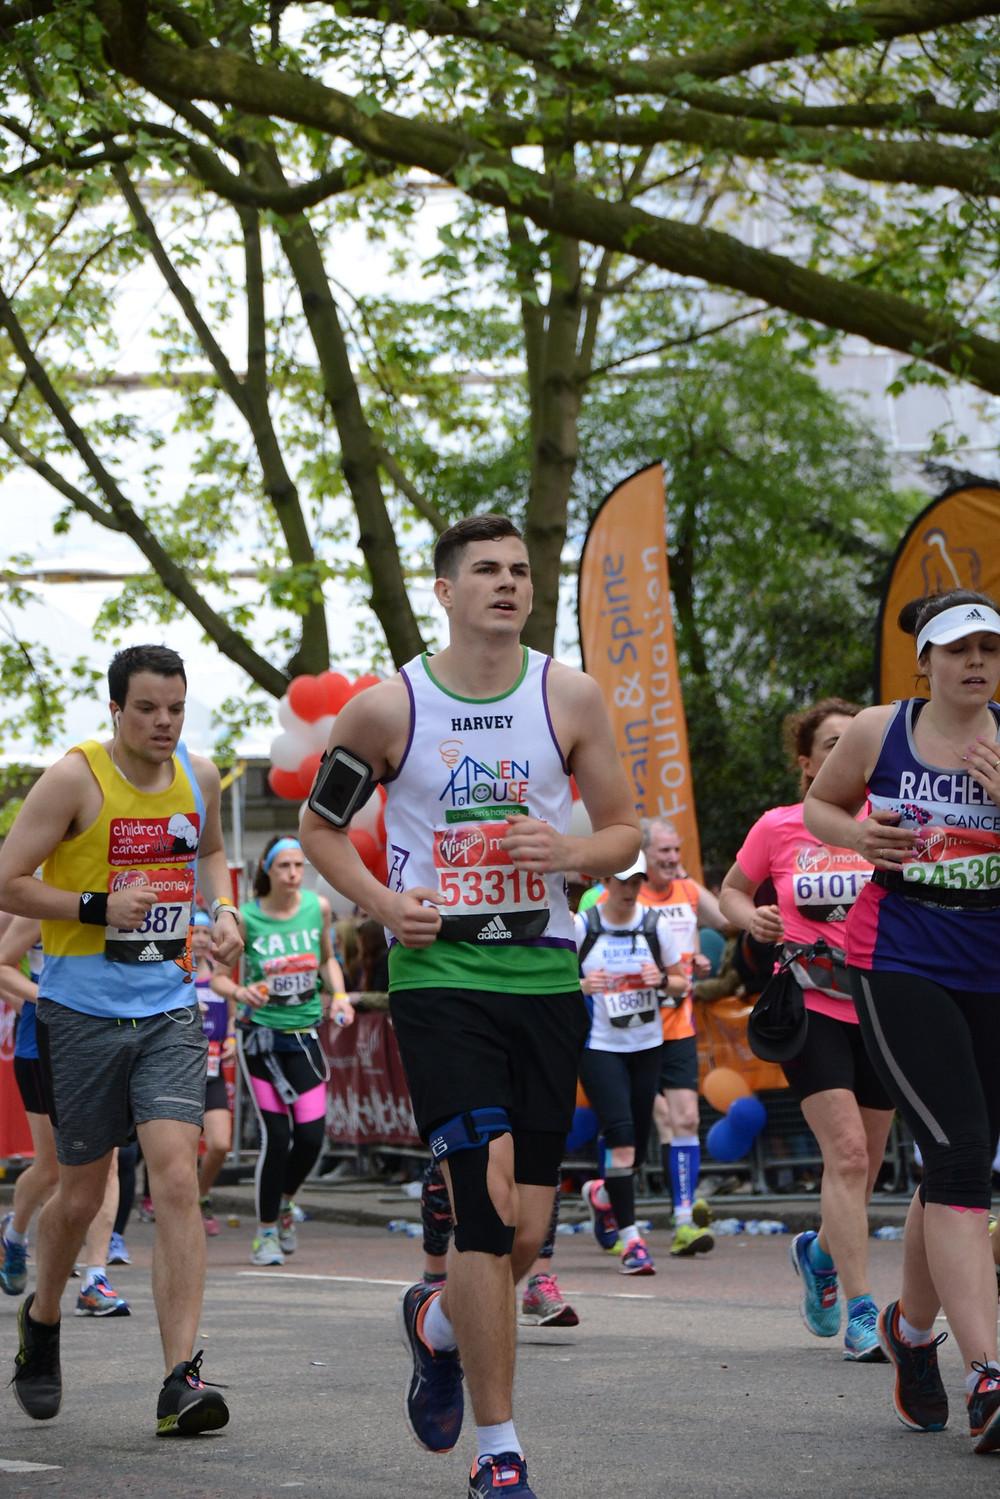 Harvey Starmar, running the London Marathon for Haven House